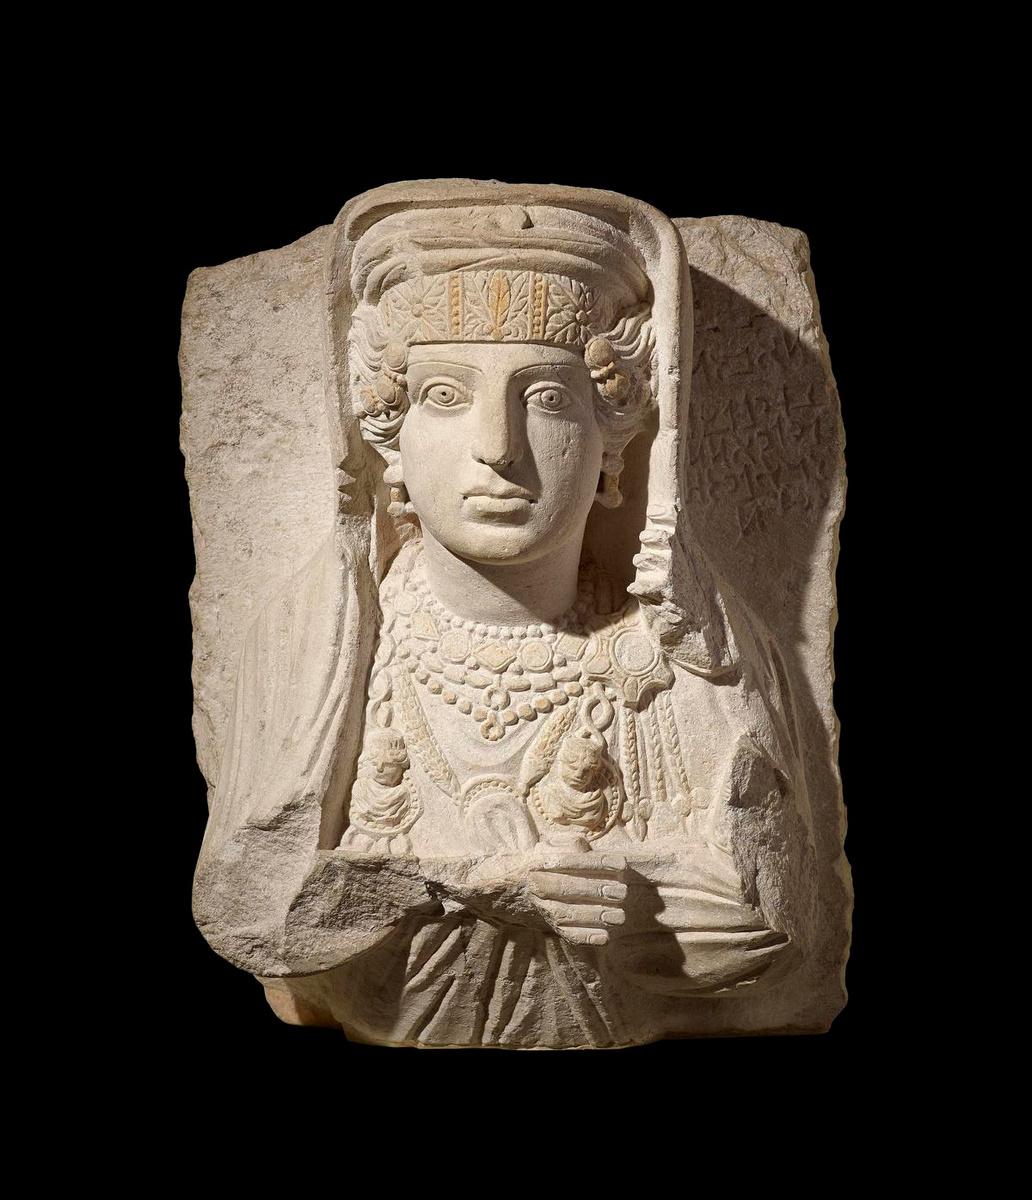 Grafreliëf met buste van een vrouwKalksteen, 200-273 n.Chr., Tadmoer, het Romeinse Palmyra (Syrië), The Trustees of the British Museum